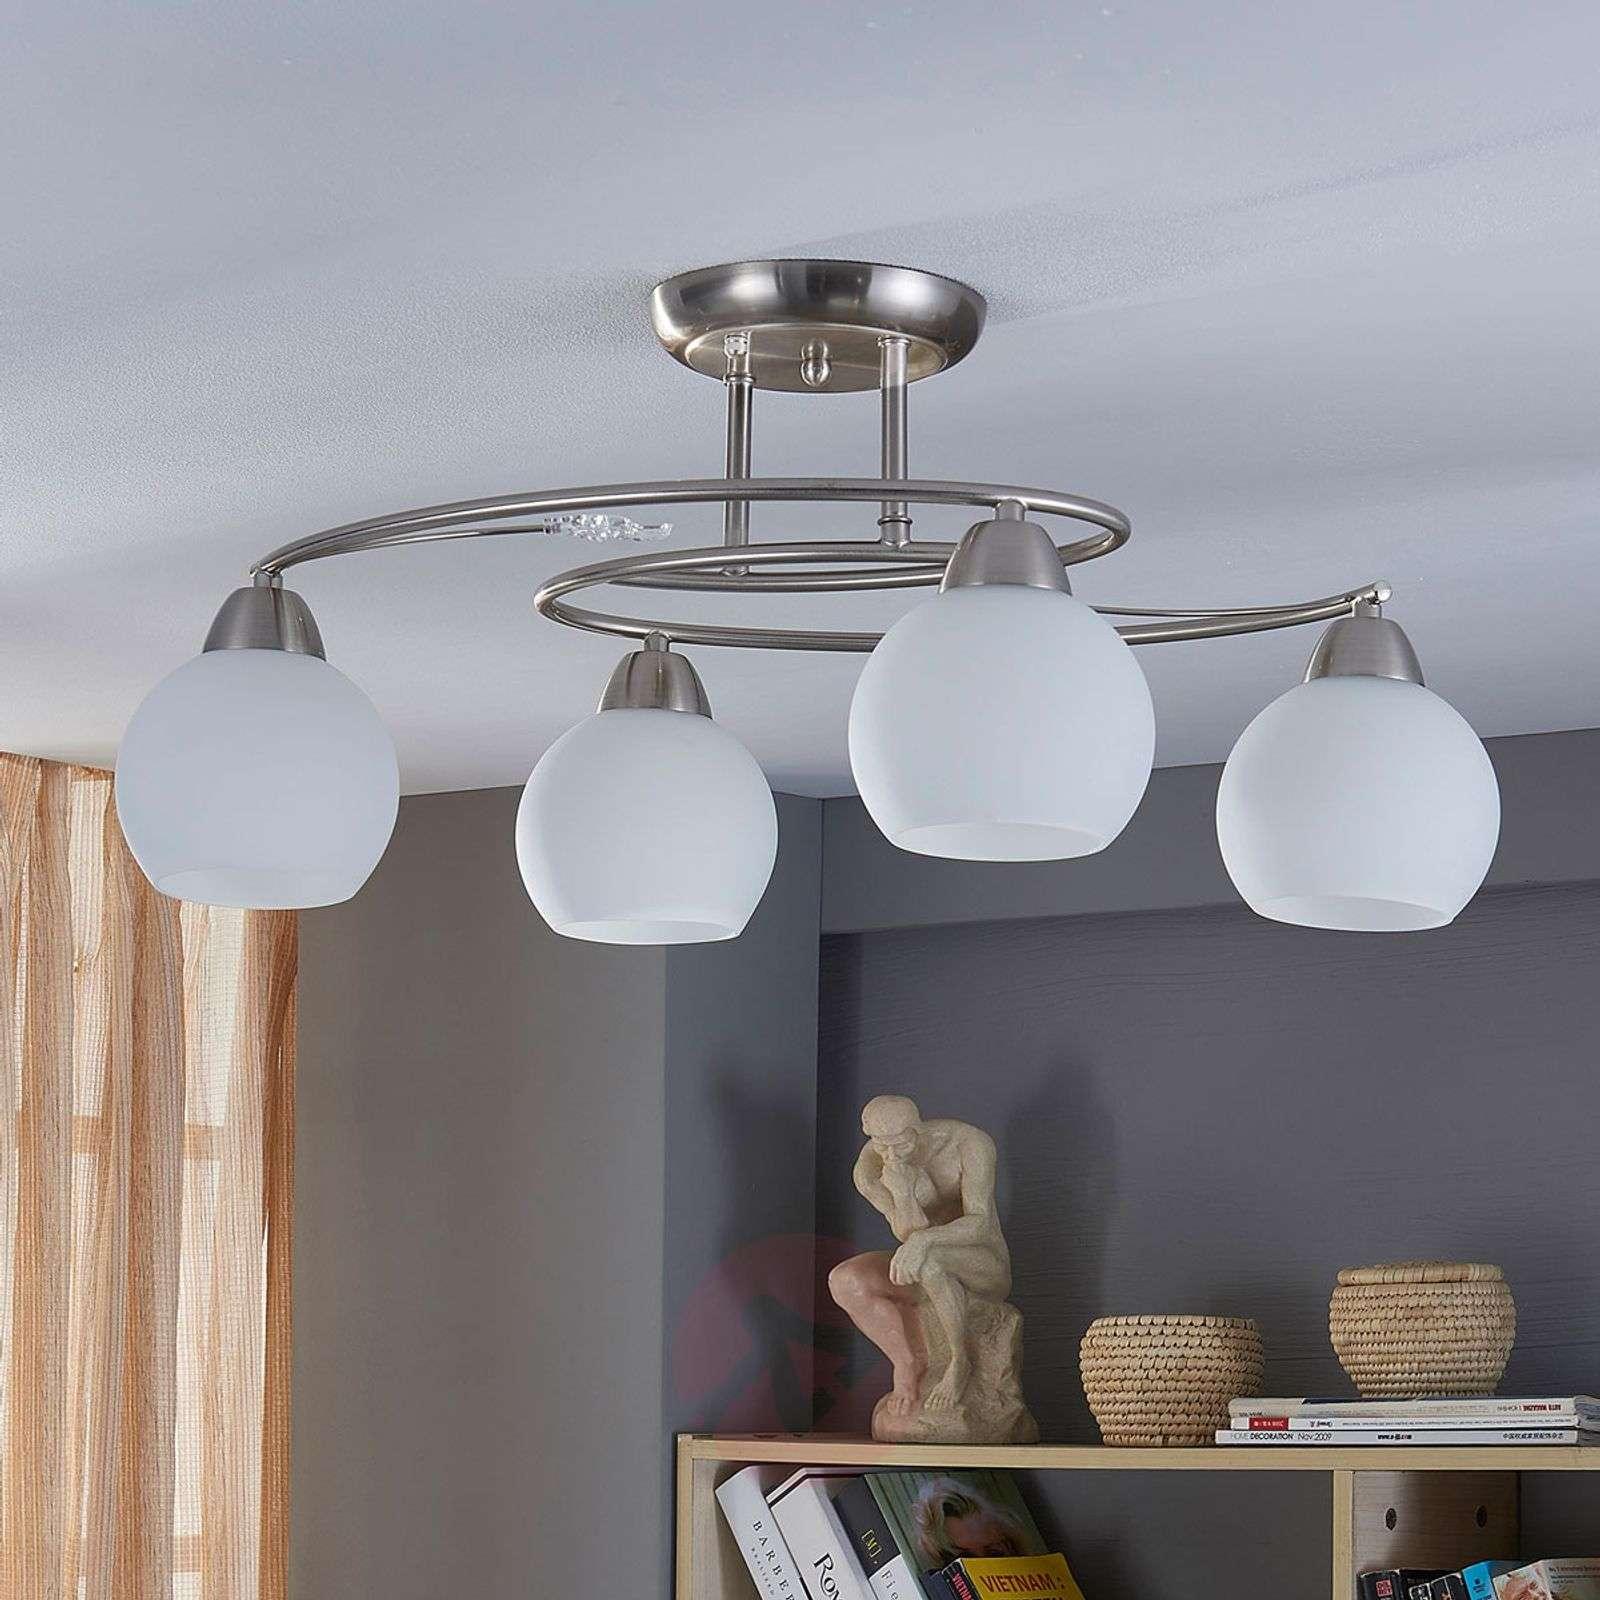 4-bulb ceiling light Svean-9620765-01